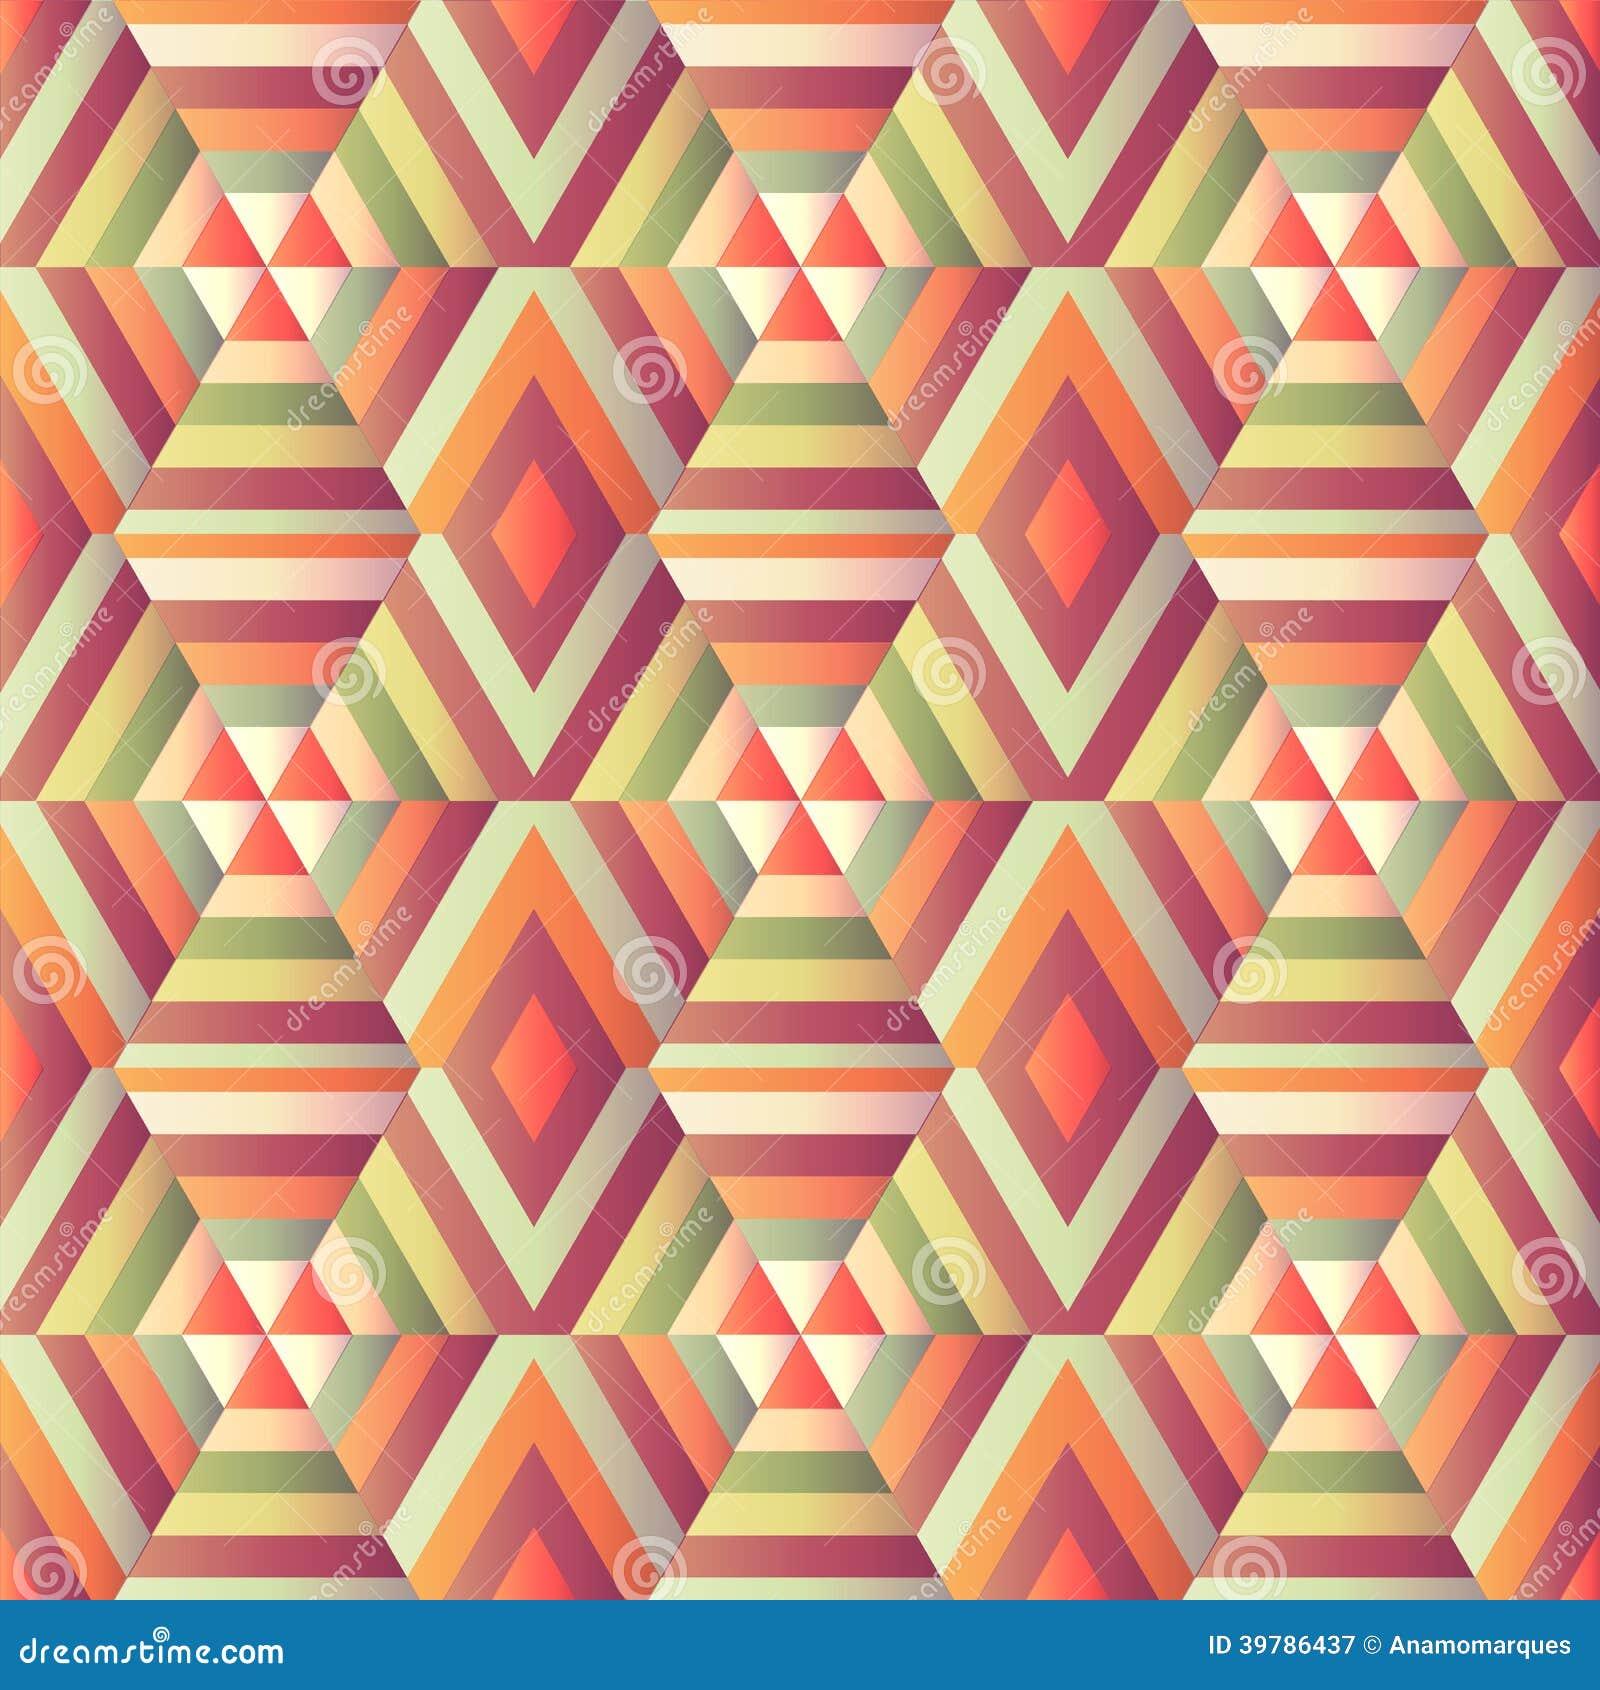 Geometric hexagon op illusion stock vector image 39786437 for Geometric illusion art